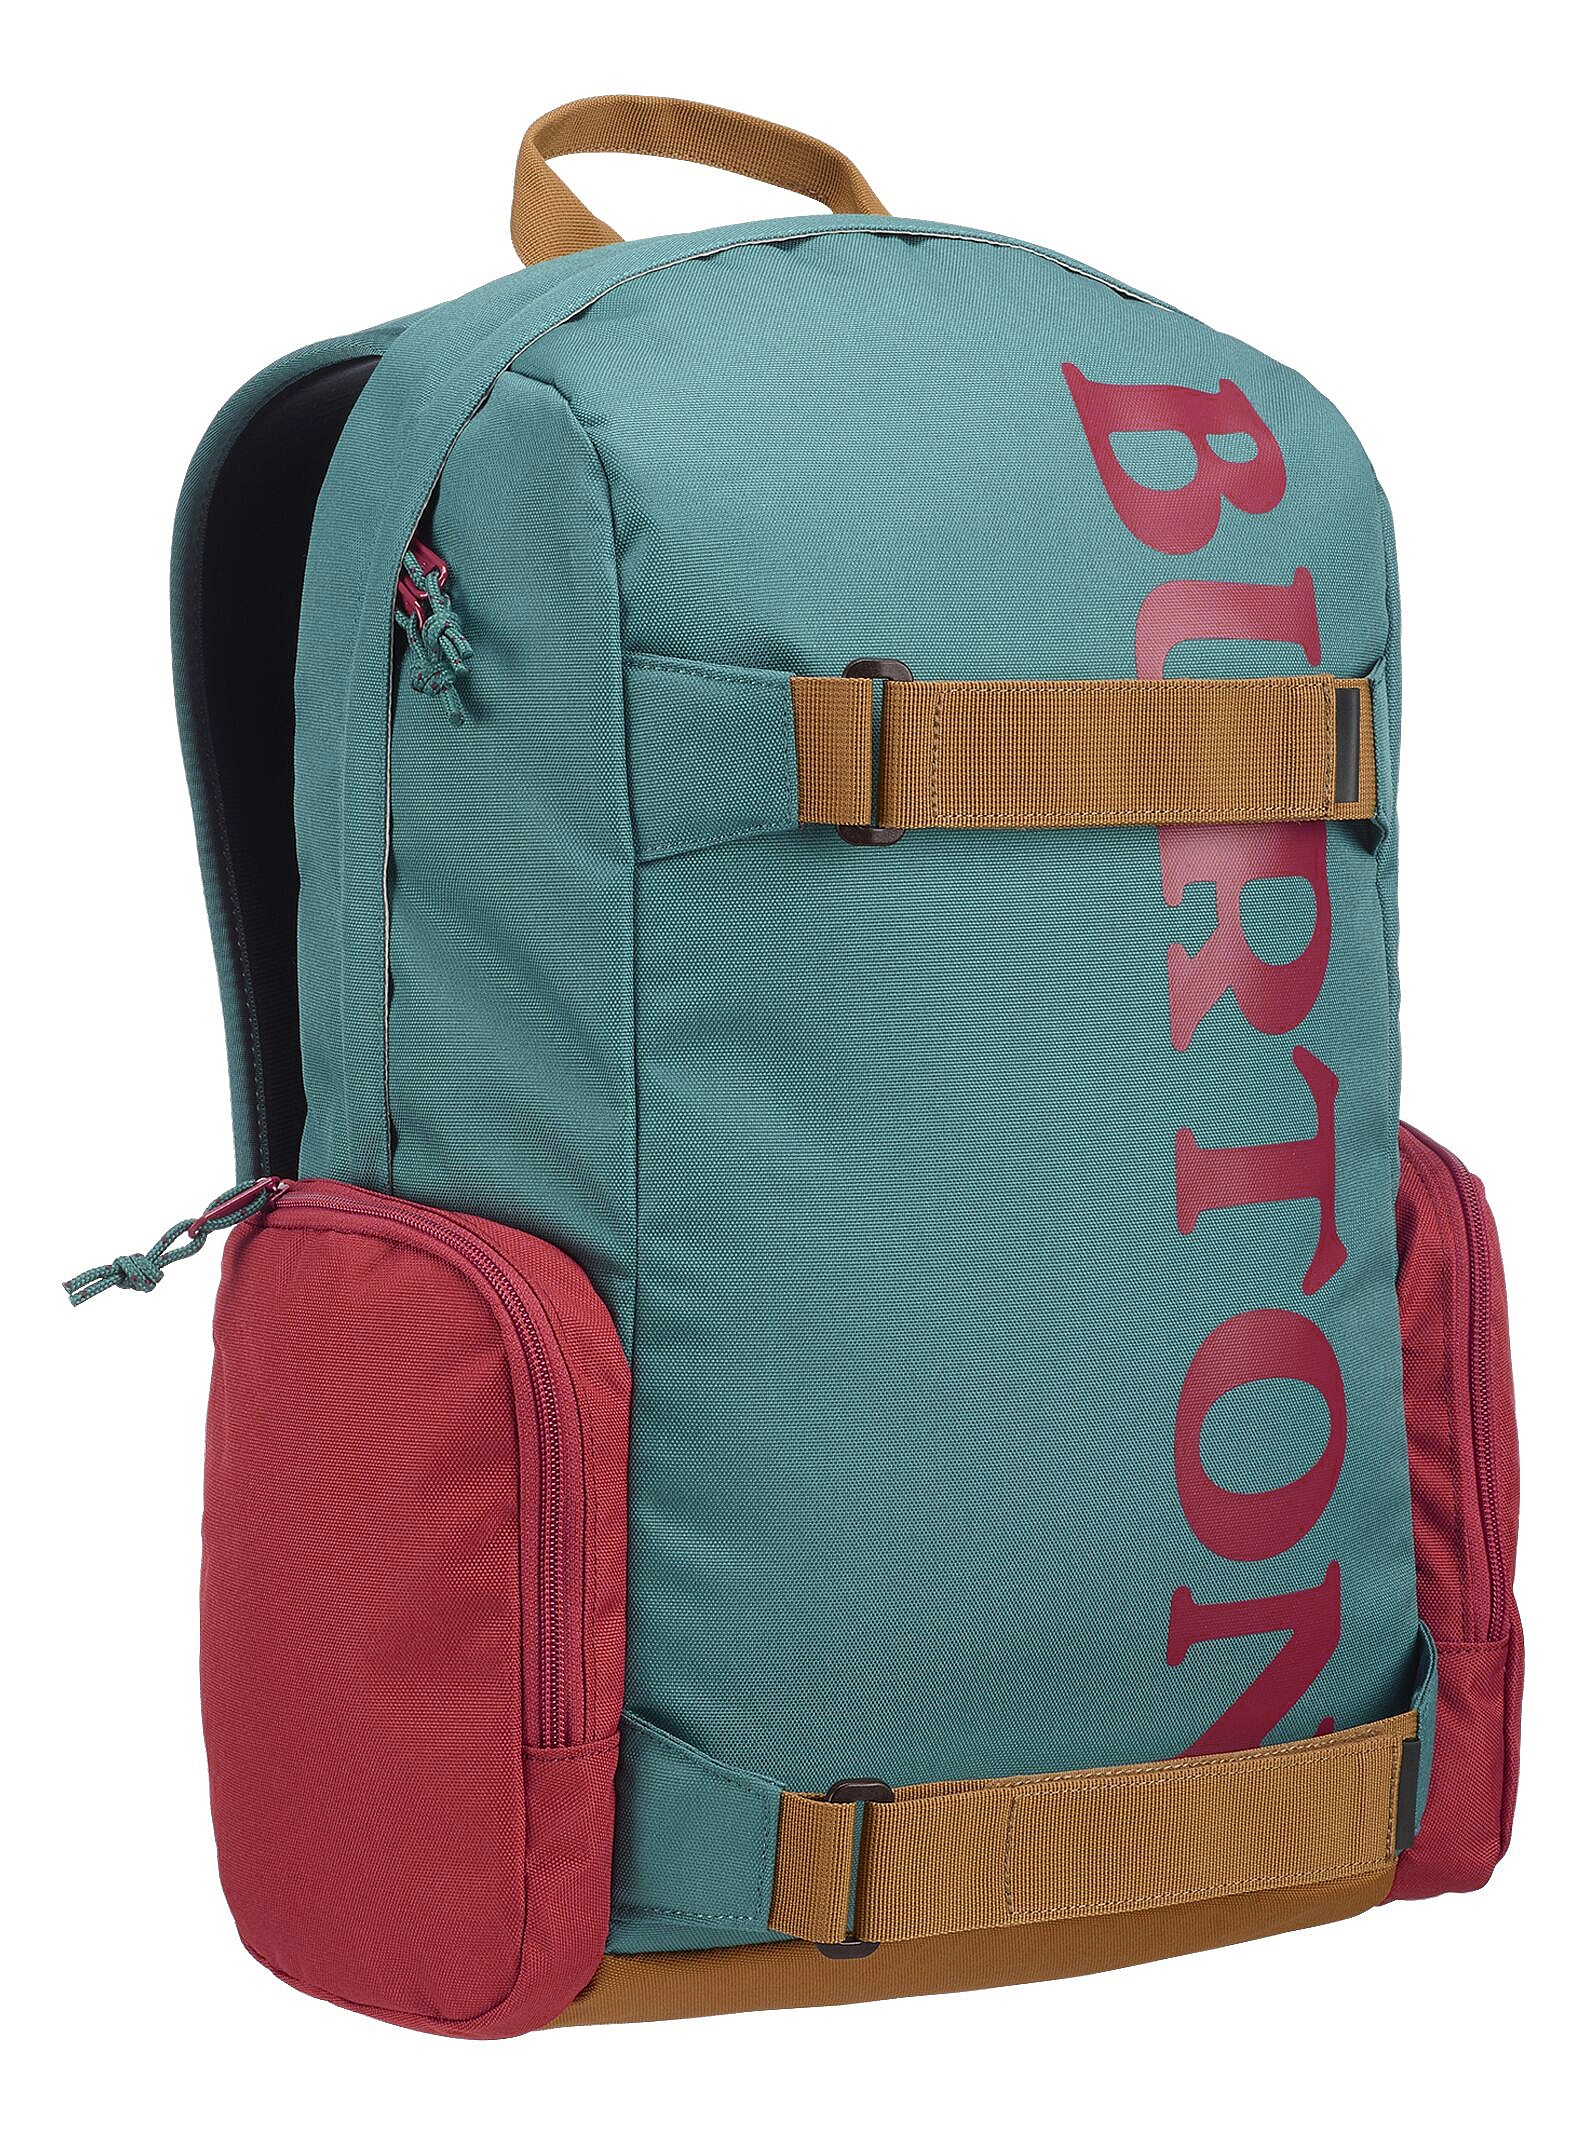 42f42adc26 batoh Burton Emphasis - Hydro 26 L